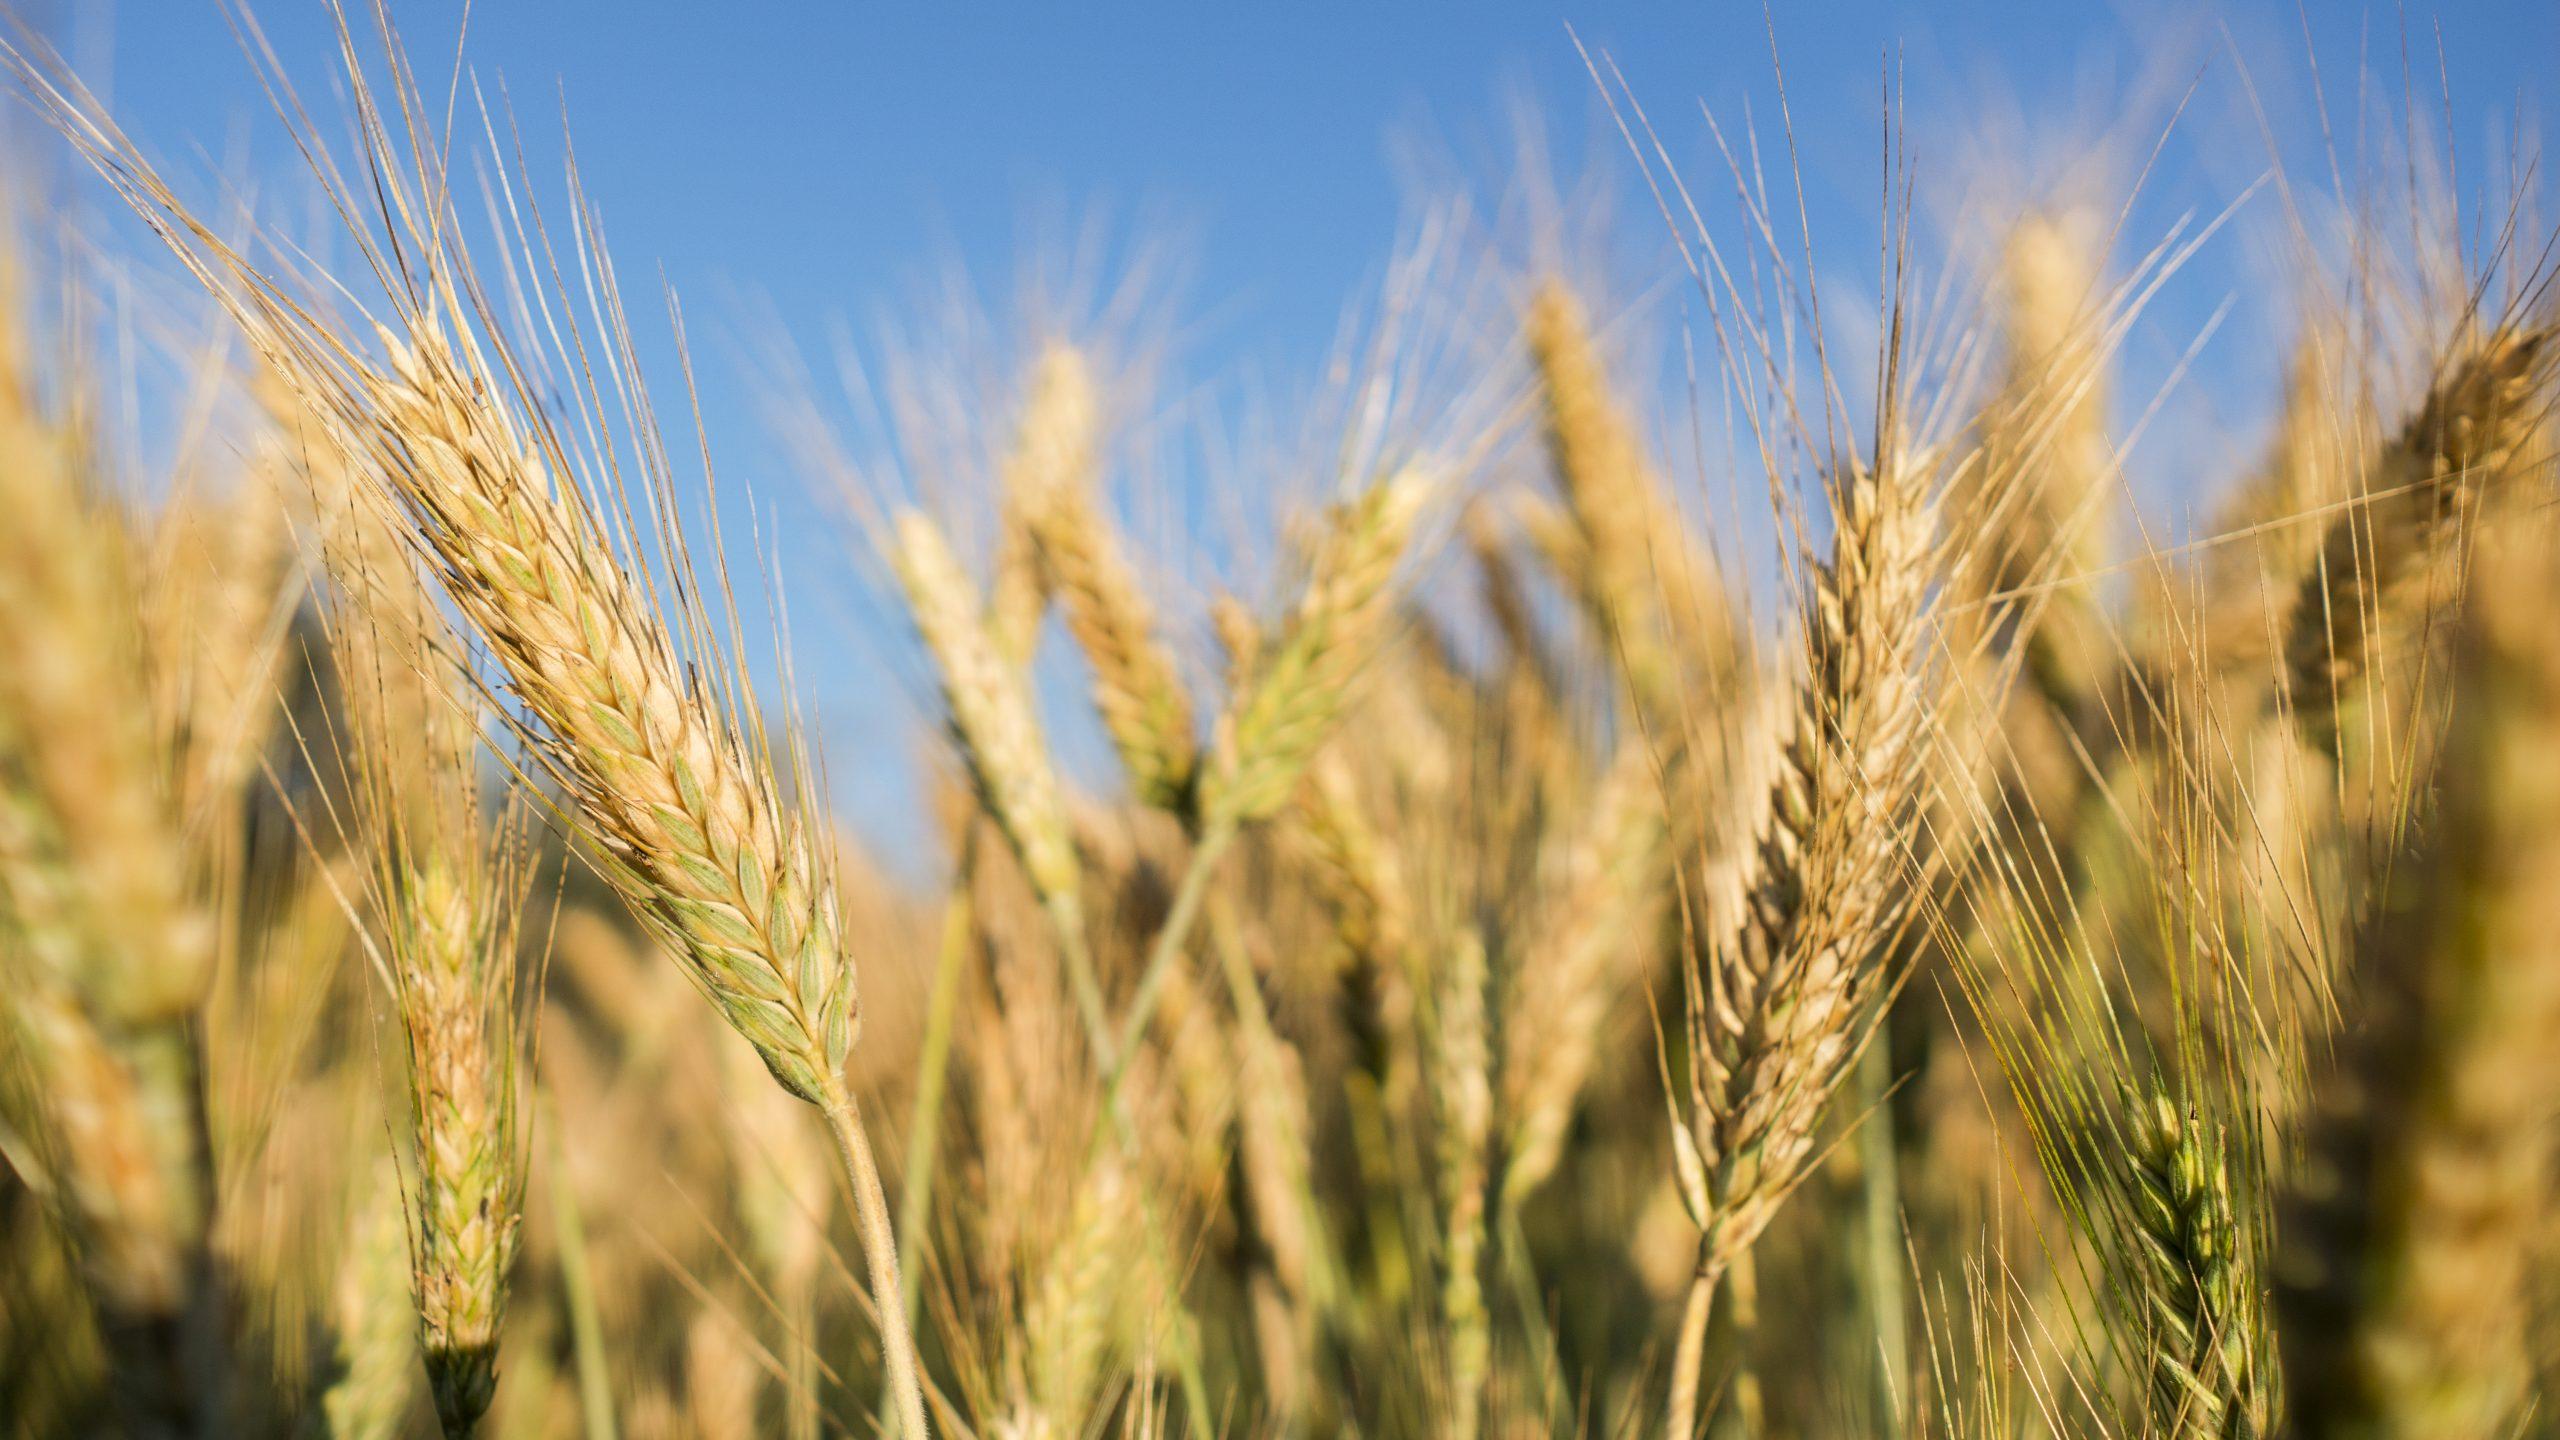 Wheat field. Close up ears of wheat.